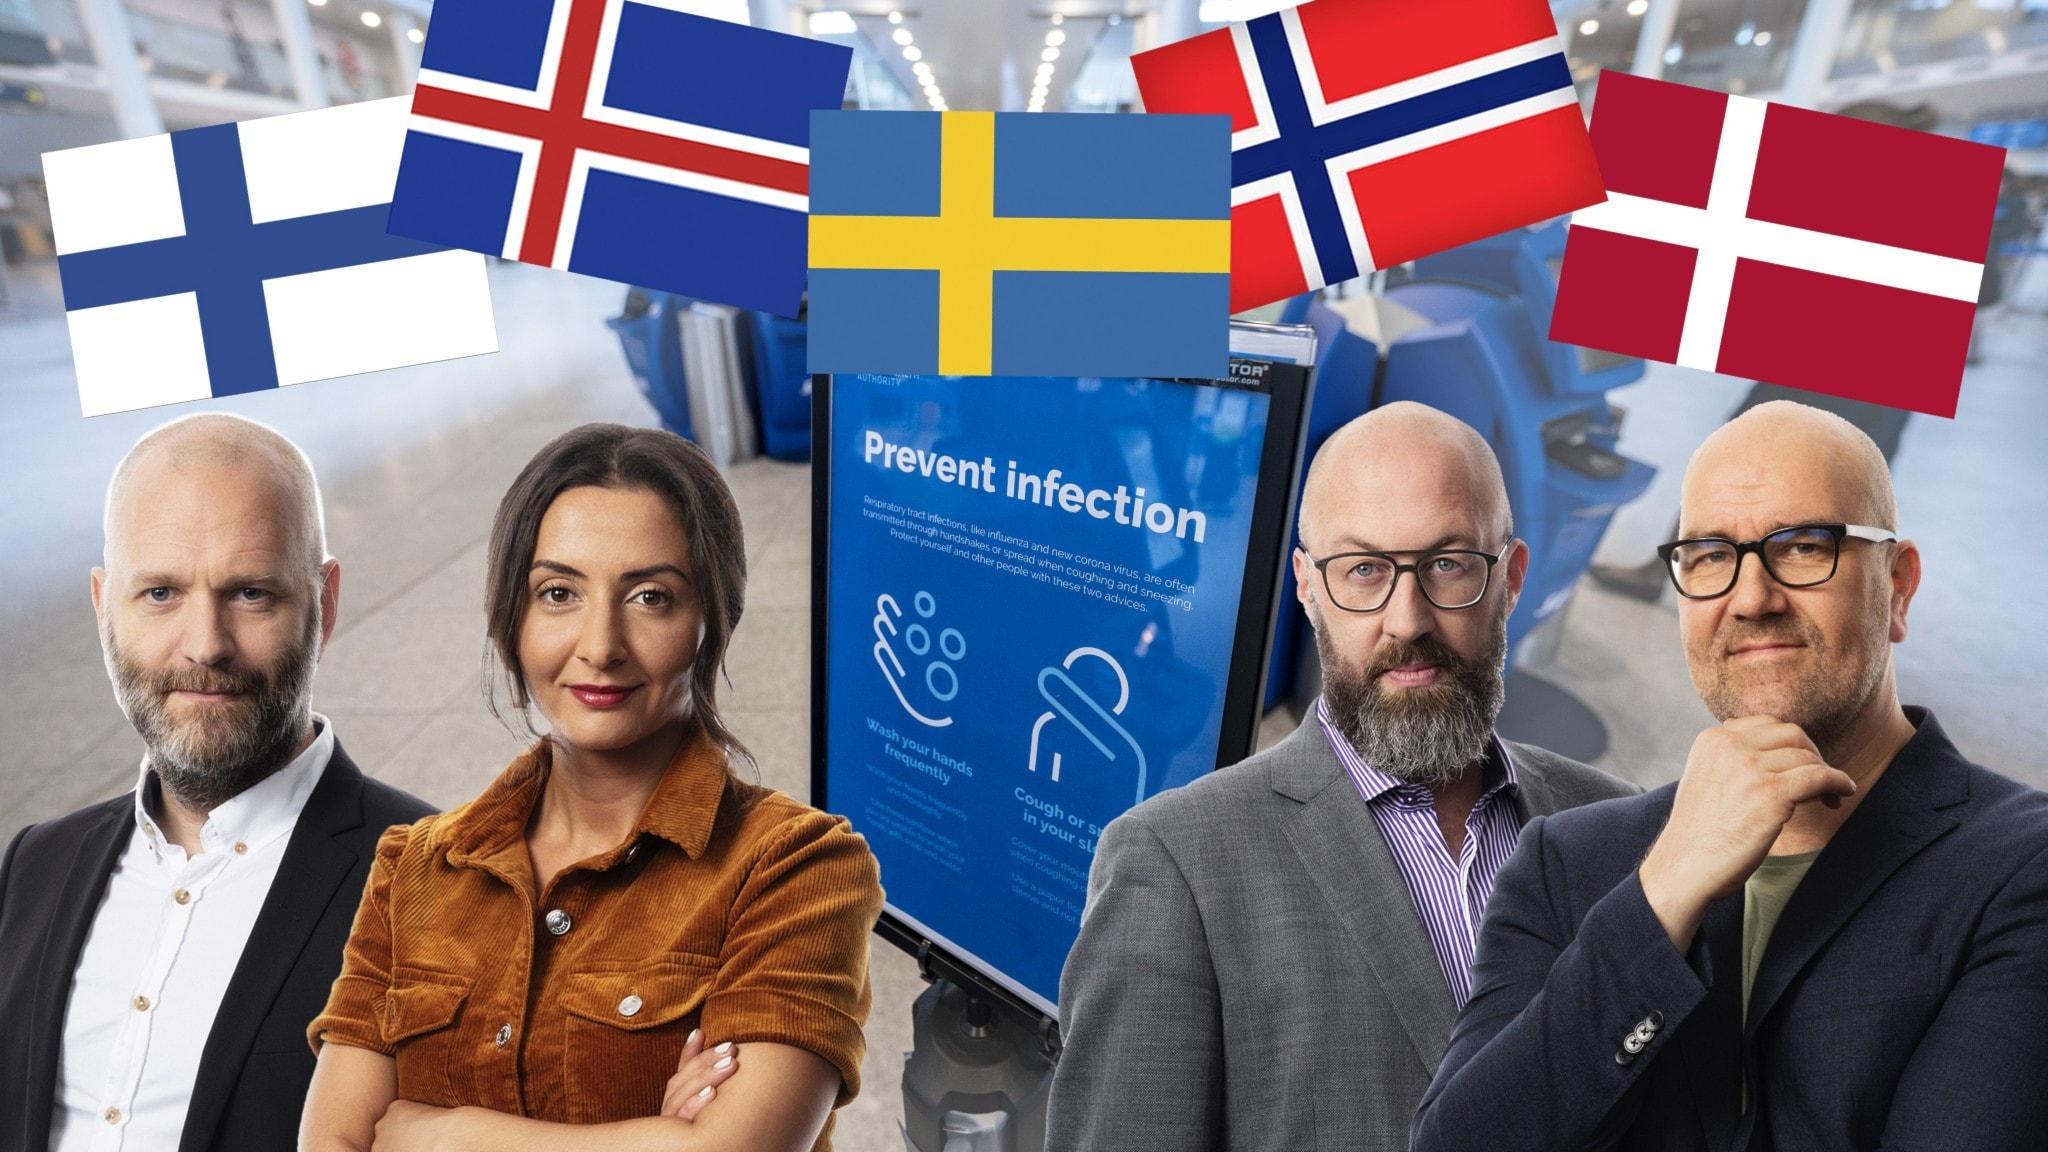 162: Nordisk politik i corona-dimman